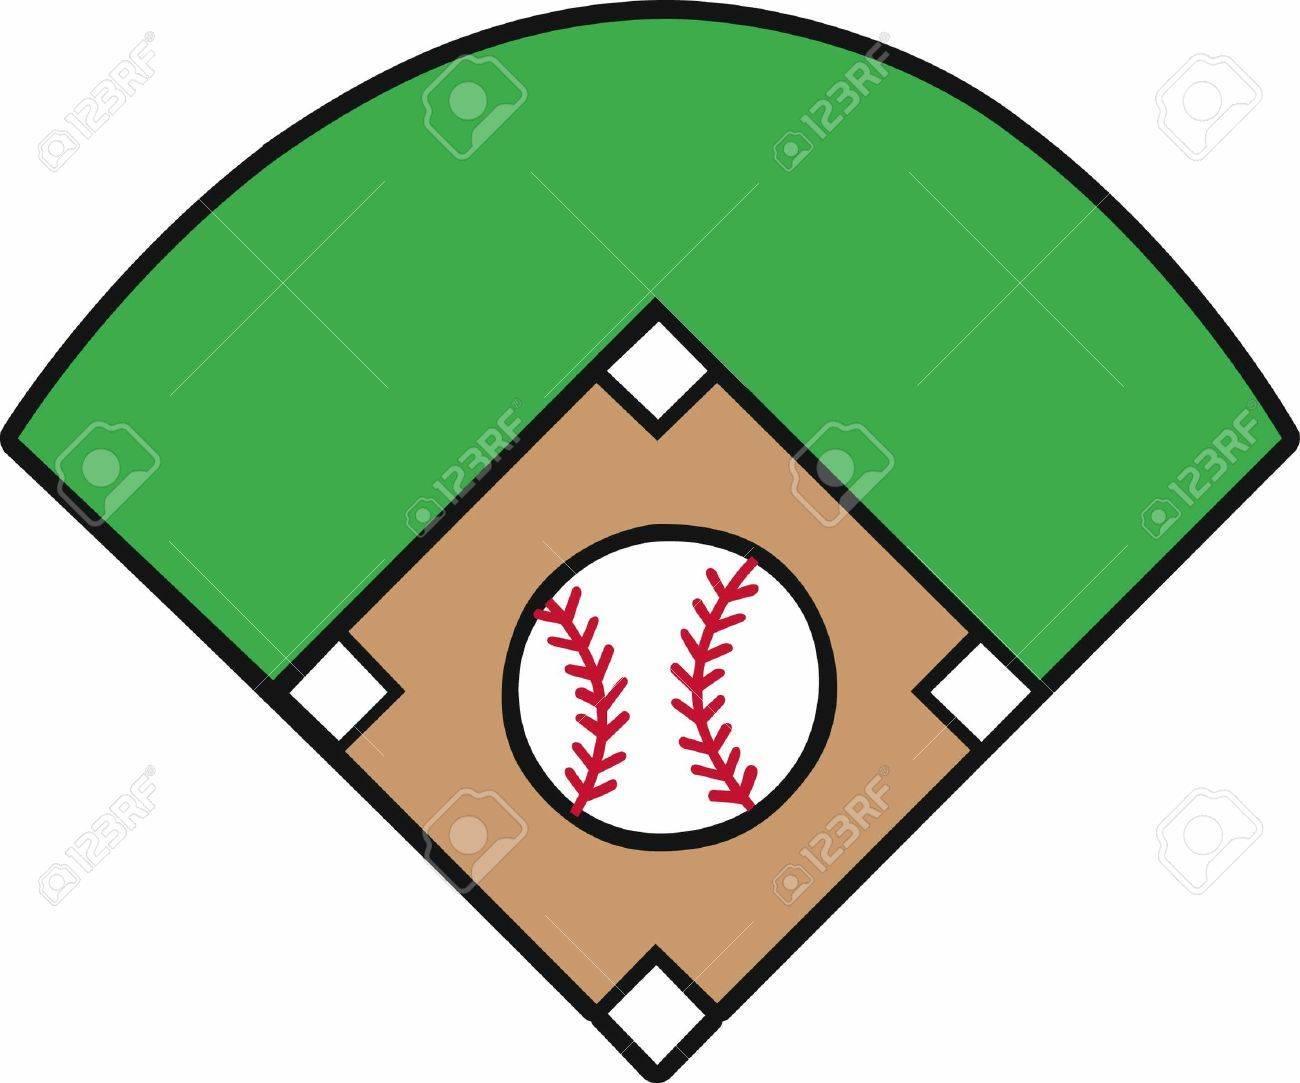 crossed bats with a yellow stars surrounding a baseball diamond rh 123rf com baseball diamond vector art